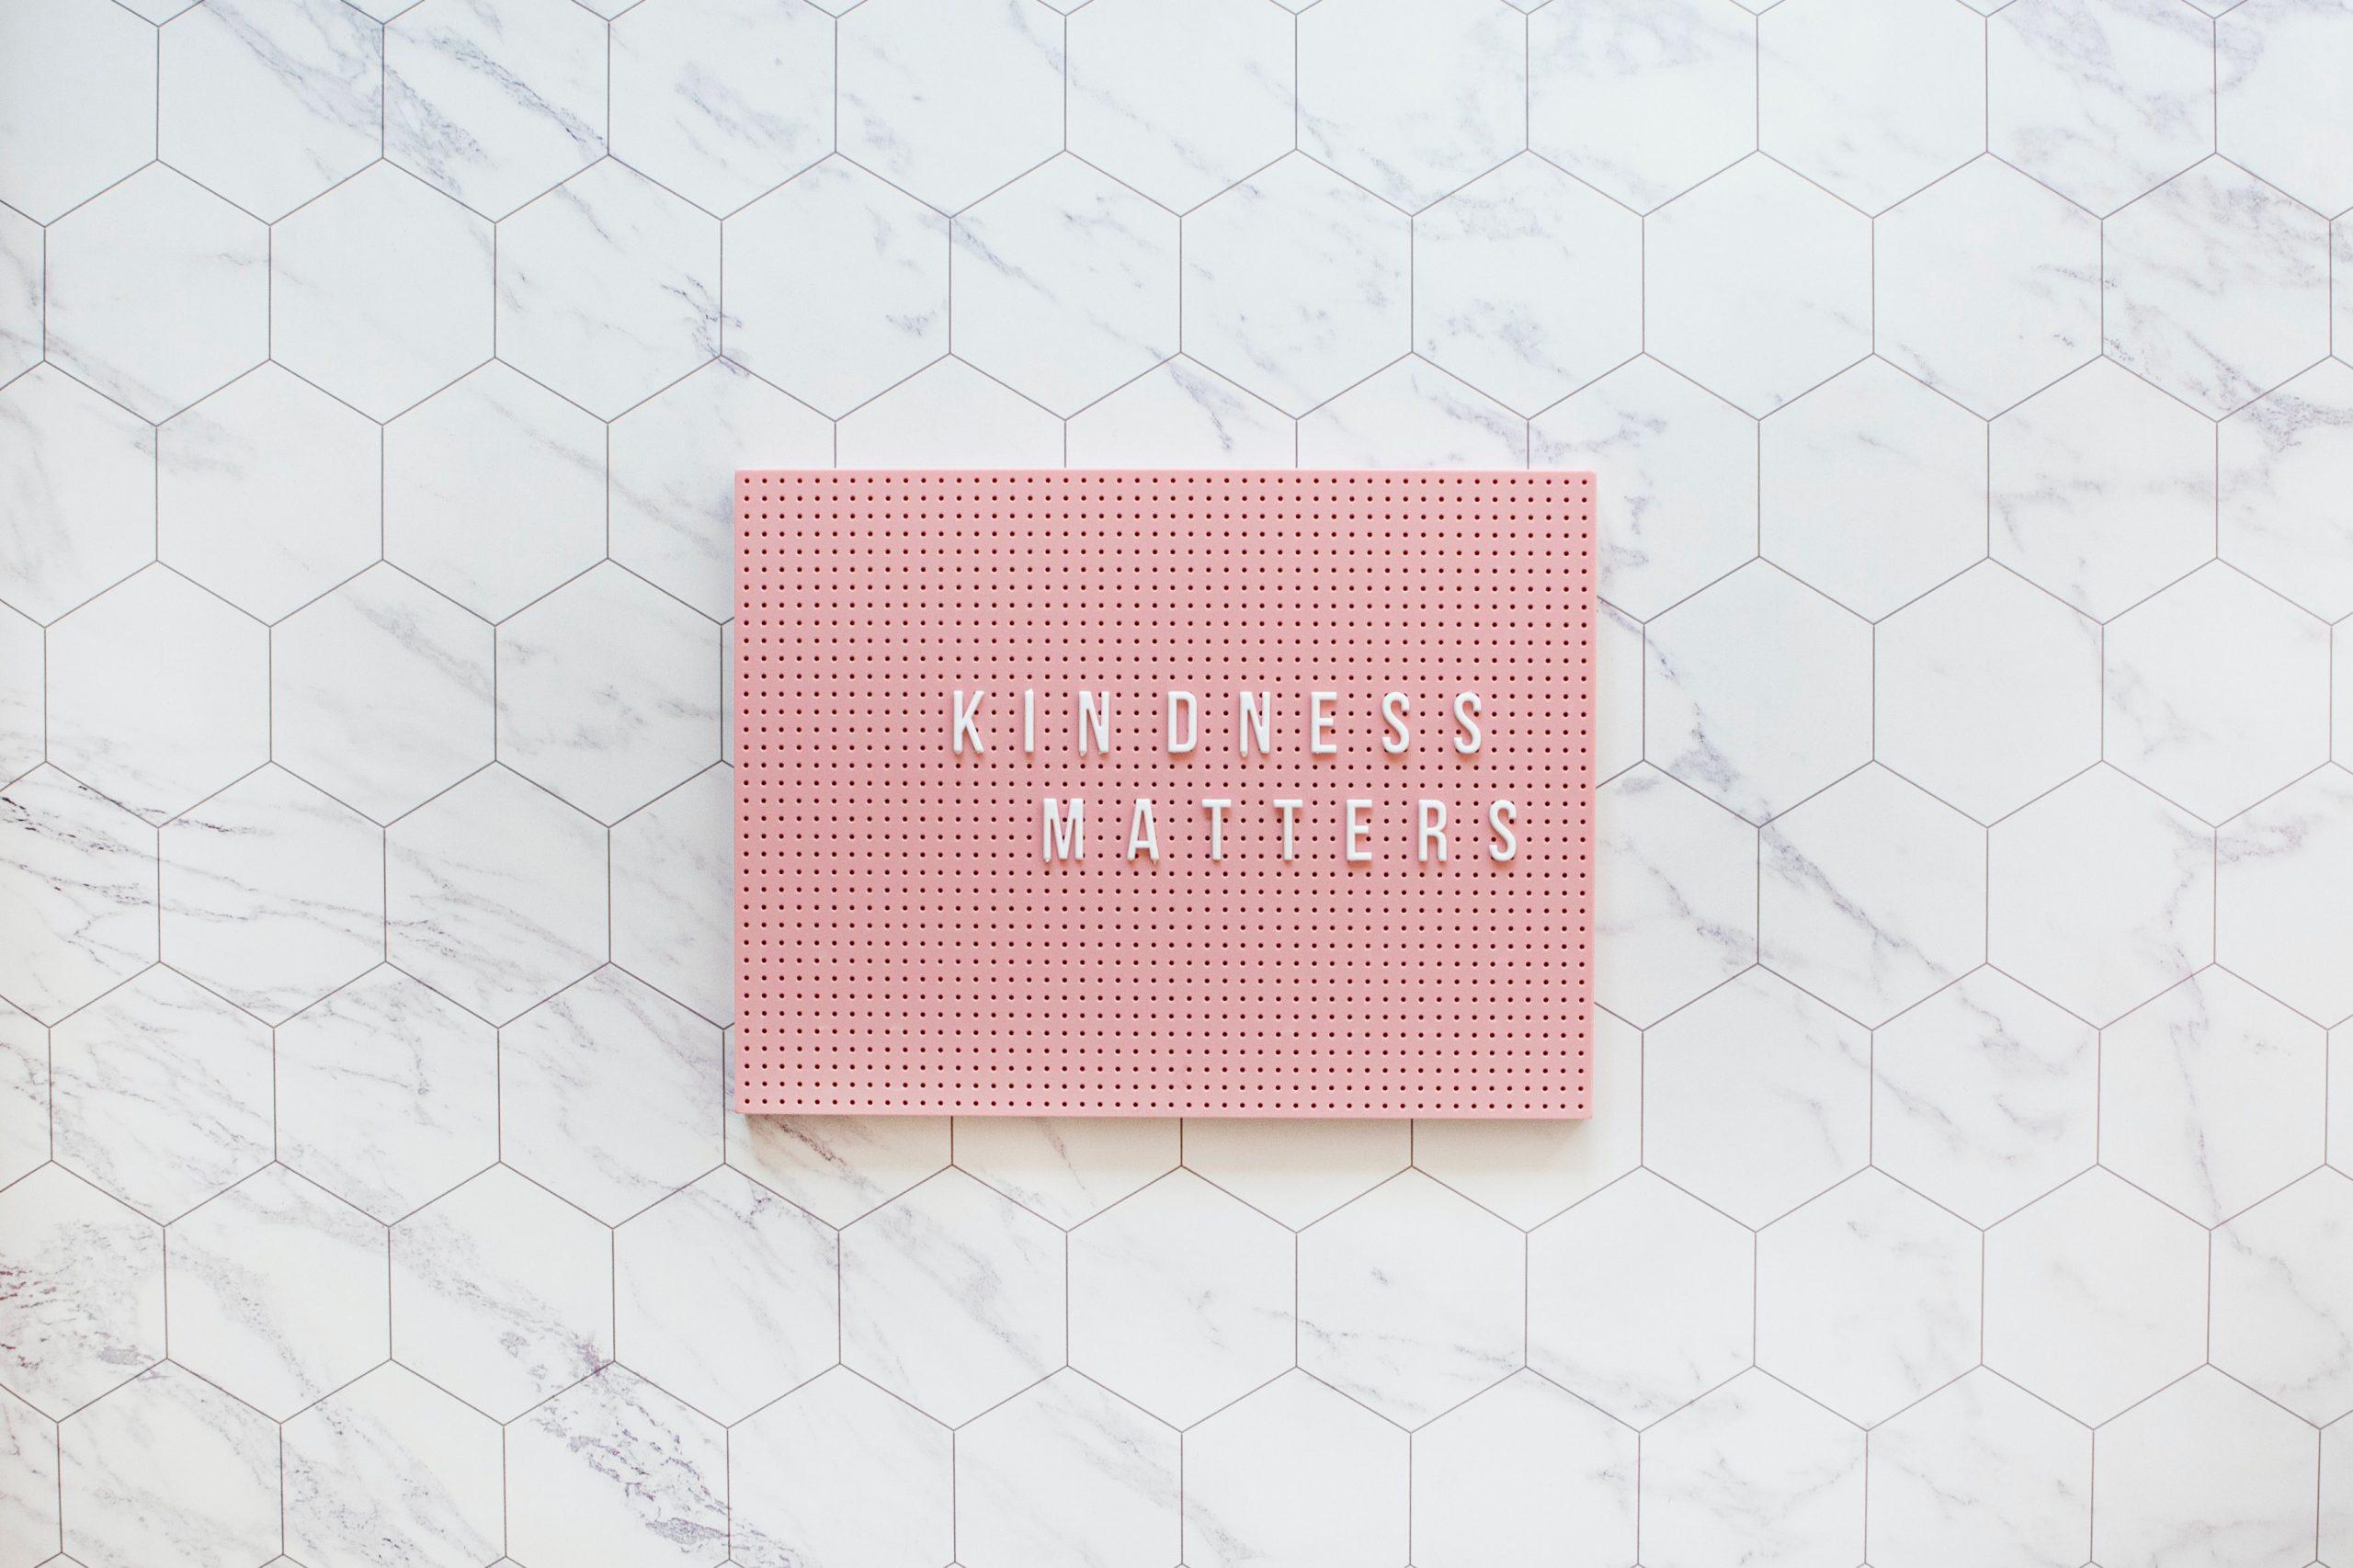 Choosing Kindness